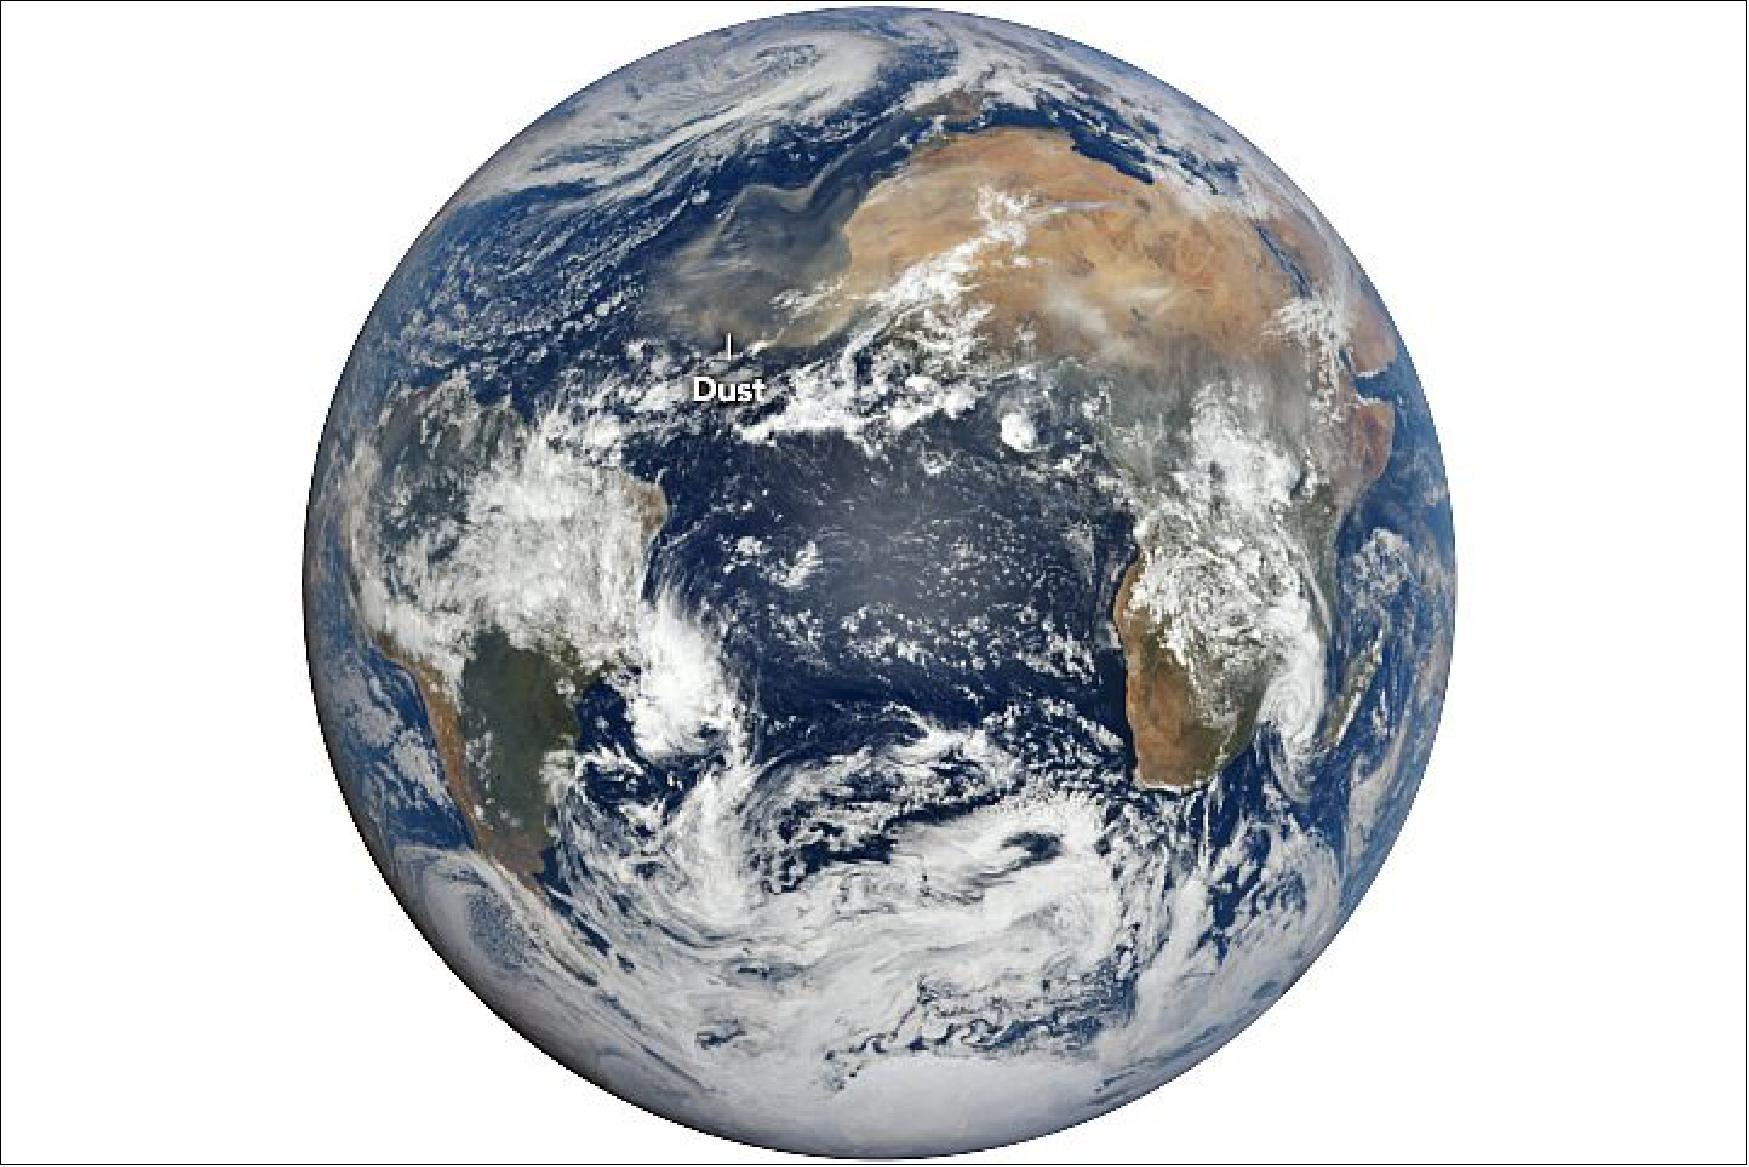 NASA Partners ISRO to develop Earth System Observatory | நாசா, இஸ்ரோ உடன் கூட்டு சேர்ந்து பூமி அமைப்பு ஆய்வகத்தை உருவாக்குகிறது |_40.1